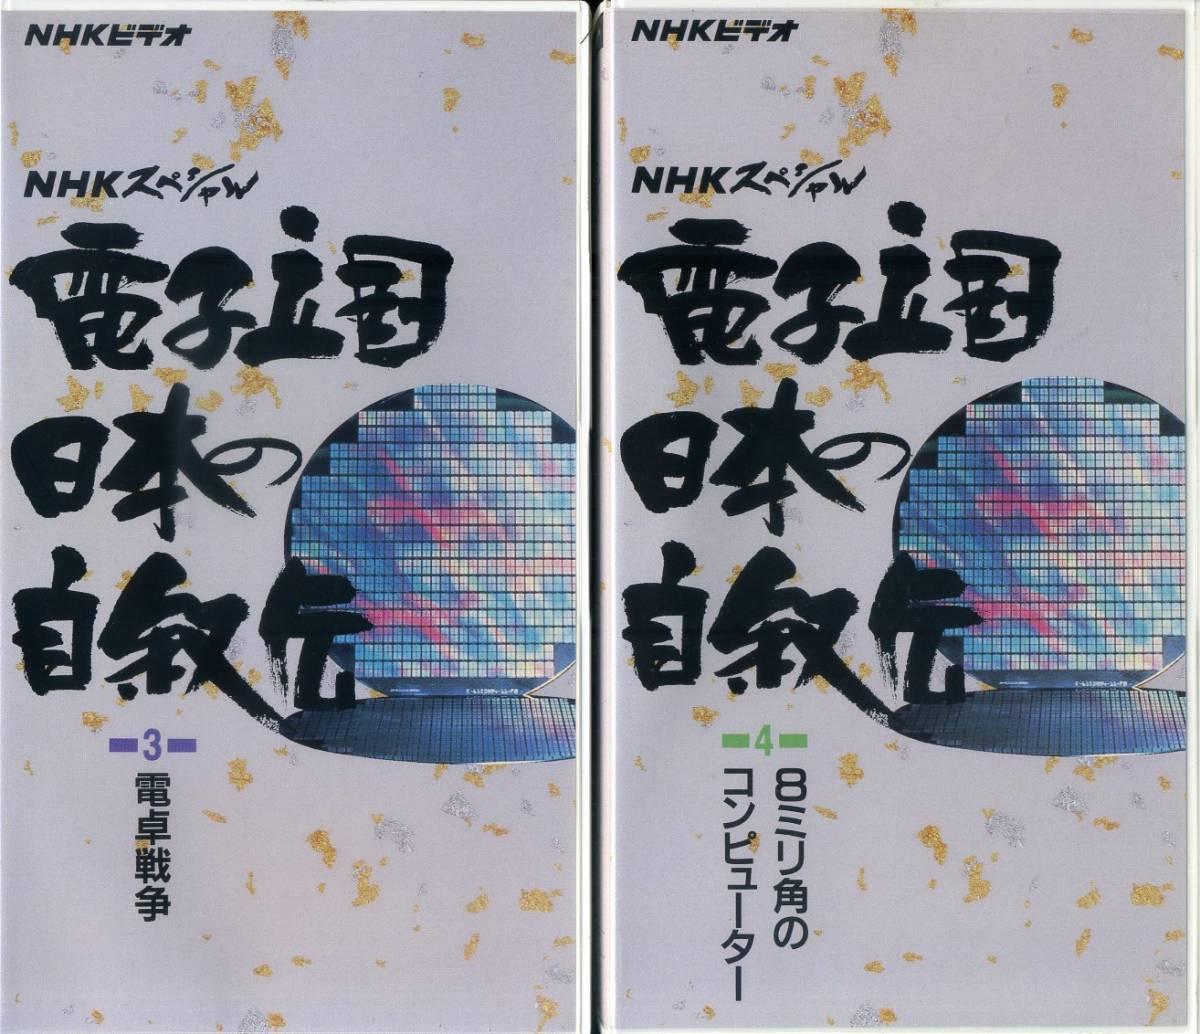 即決〈同梱歓迎〉VHS電子立国日本の自叙伝 全4巻(計4本揃) NHKビデオ◎その他多数出品中∞3167_画像4